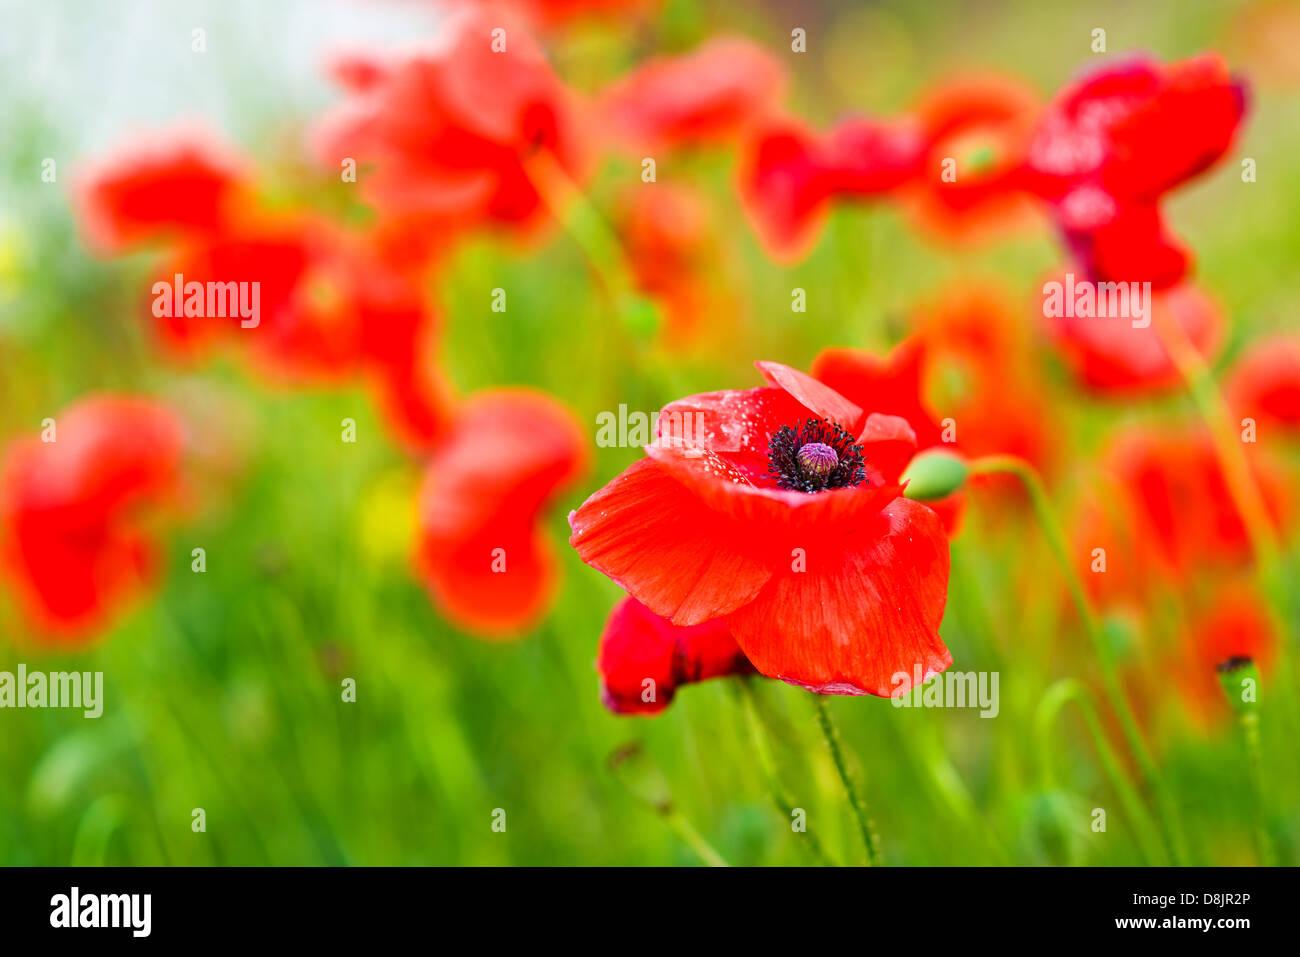 Poppy Flowers Beautiful Scarlet Poppies In The Field As Spring